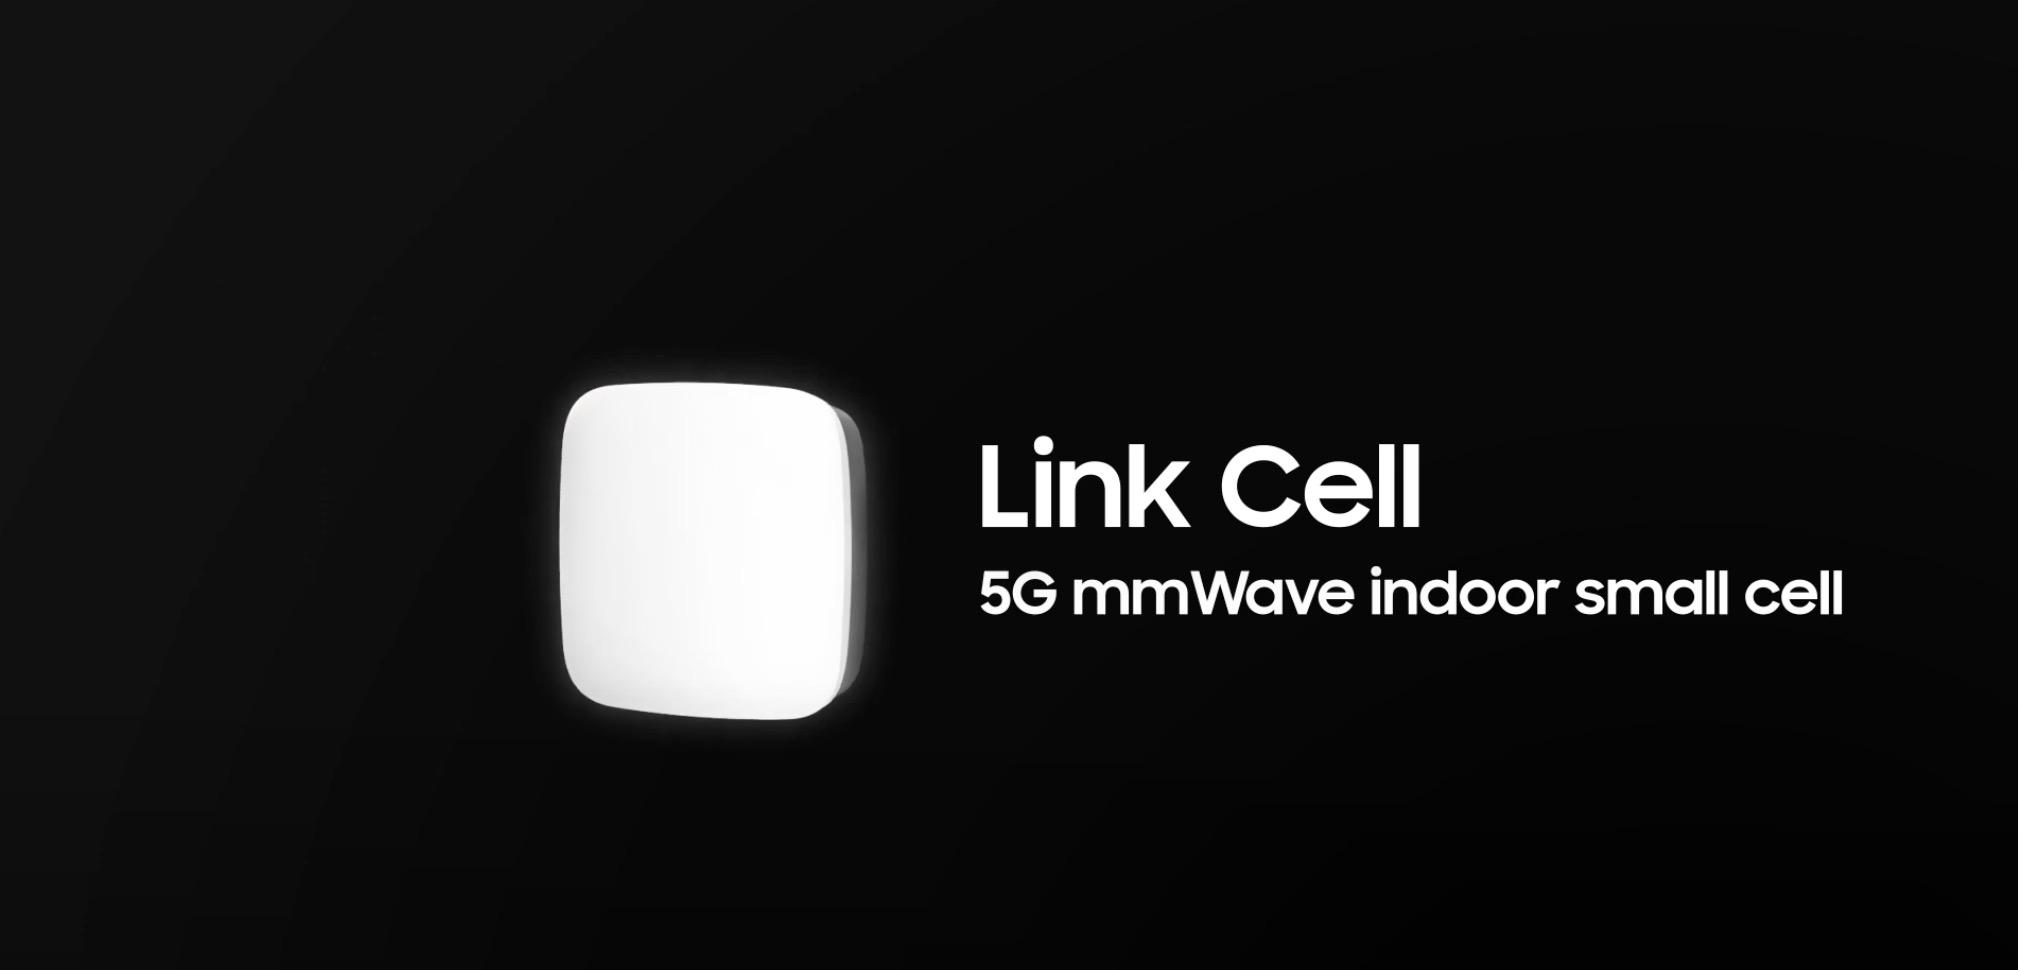 Samsung Link Cell 5G mmWave